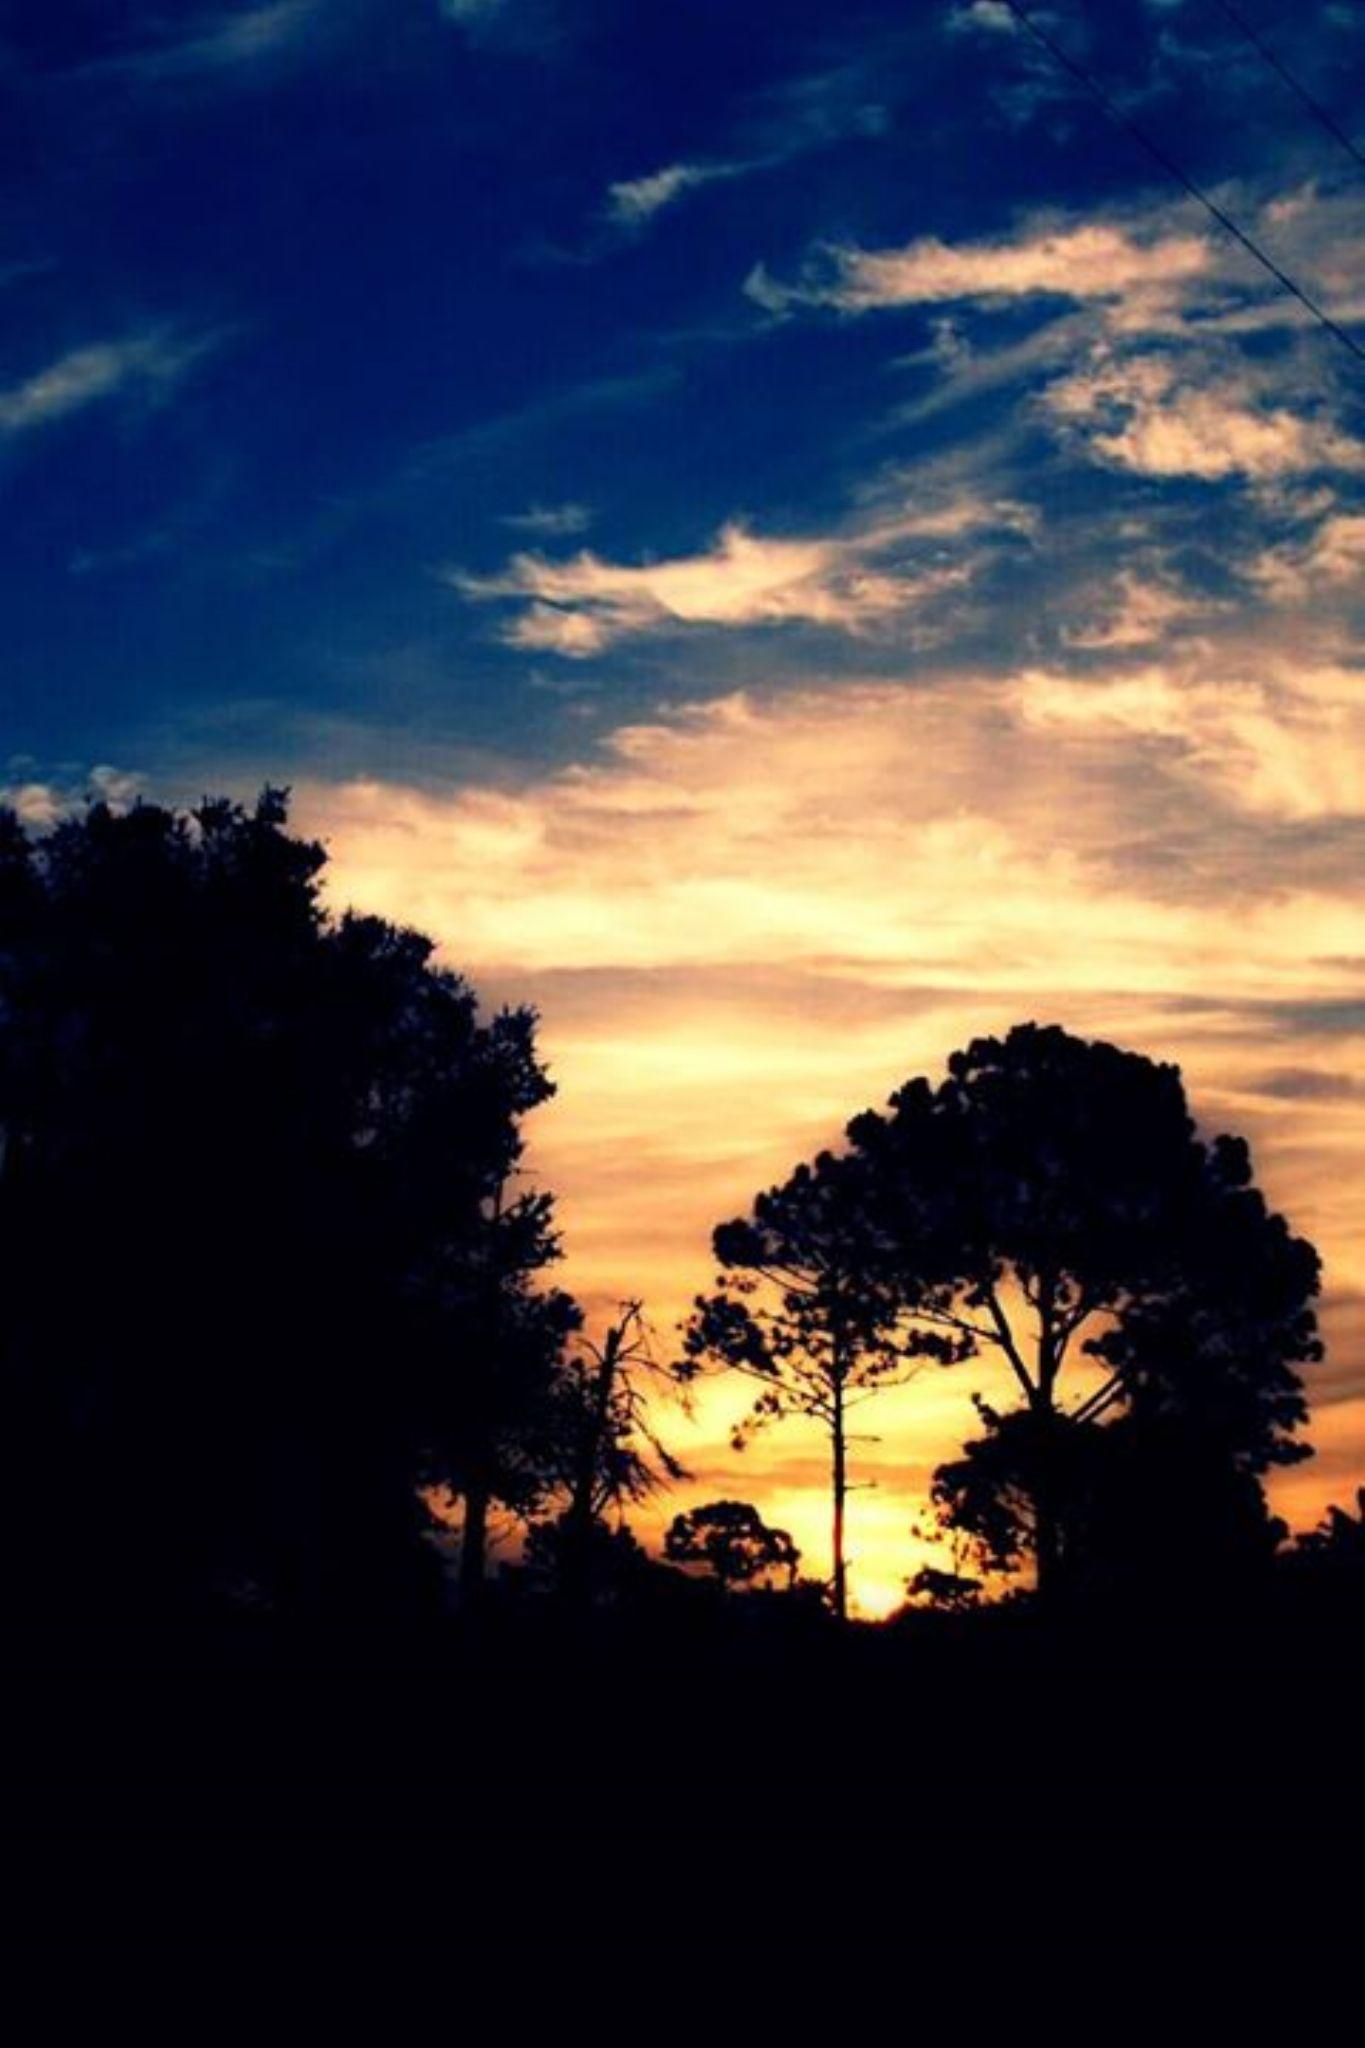 A Good Morning by Chelsey Elizabeth